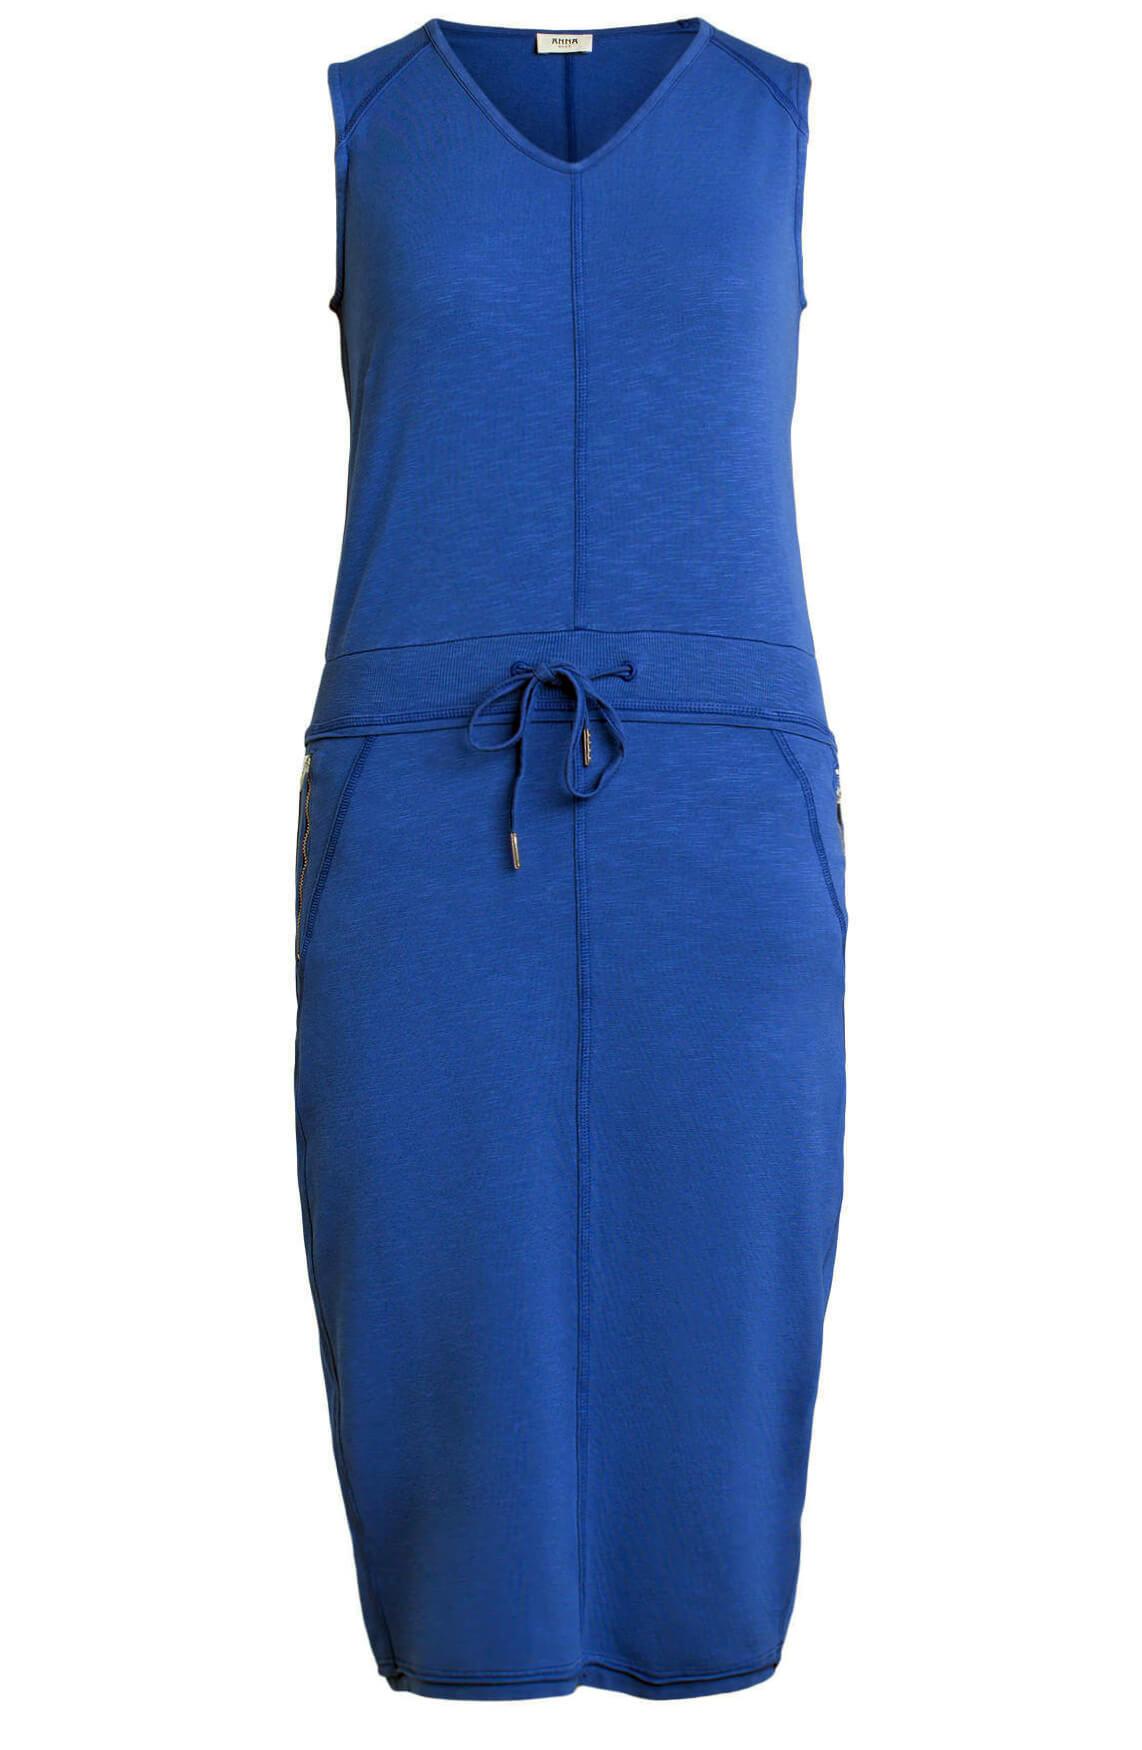 Anna Blue Dames Jurk met koordsluiting Blauw